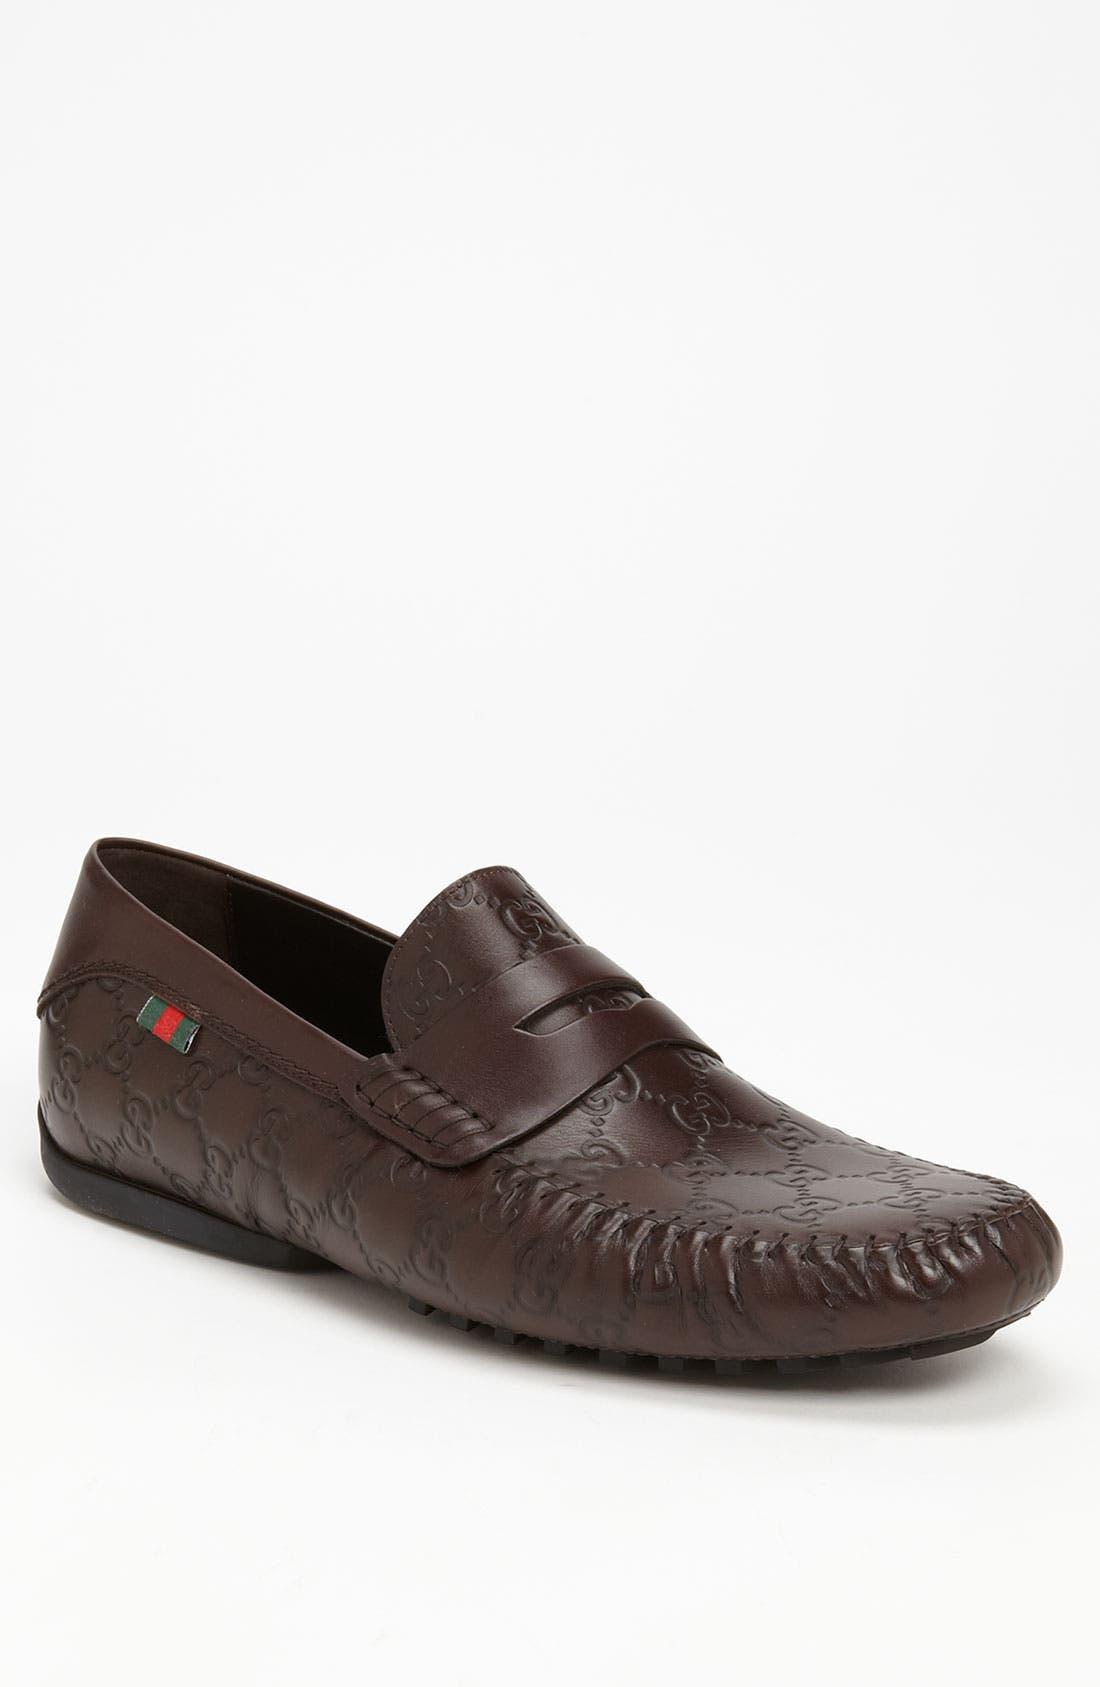 Alternate Image 1 Selected - Gucci 'San Marino' Driving Shoe